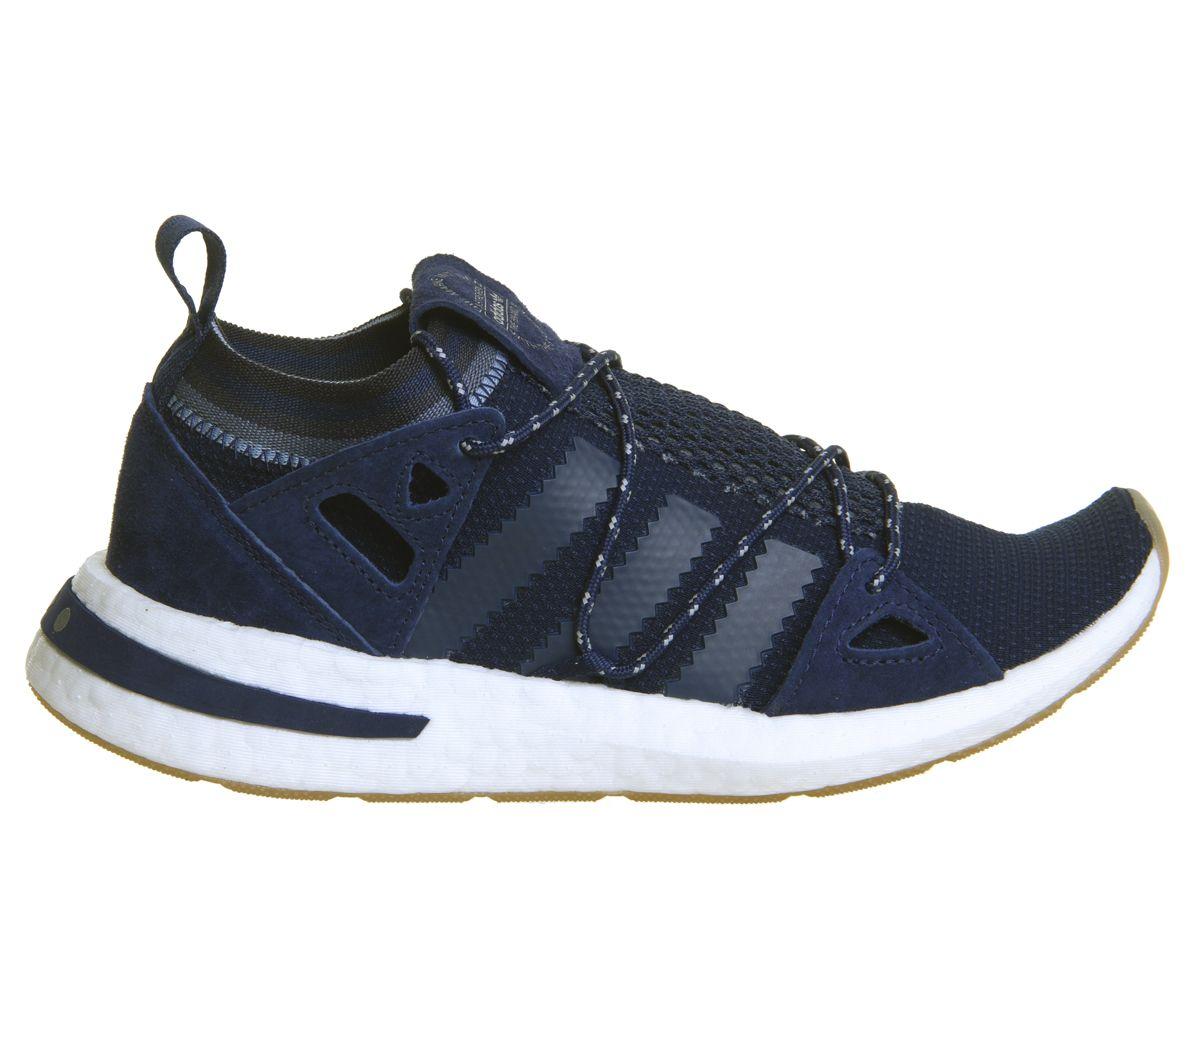 Mujer-Adidas-Arkyn-Zapatillas-Universo-Azul-Oscuro-Goma-Zapatillas-Deportivas miniatura 4